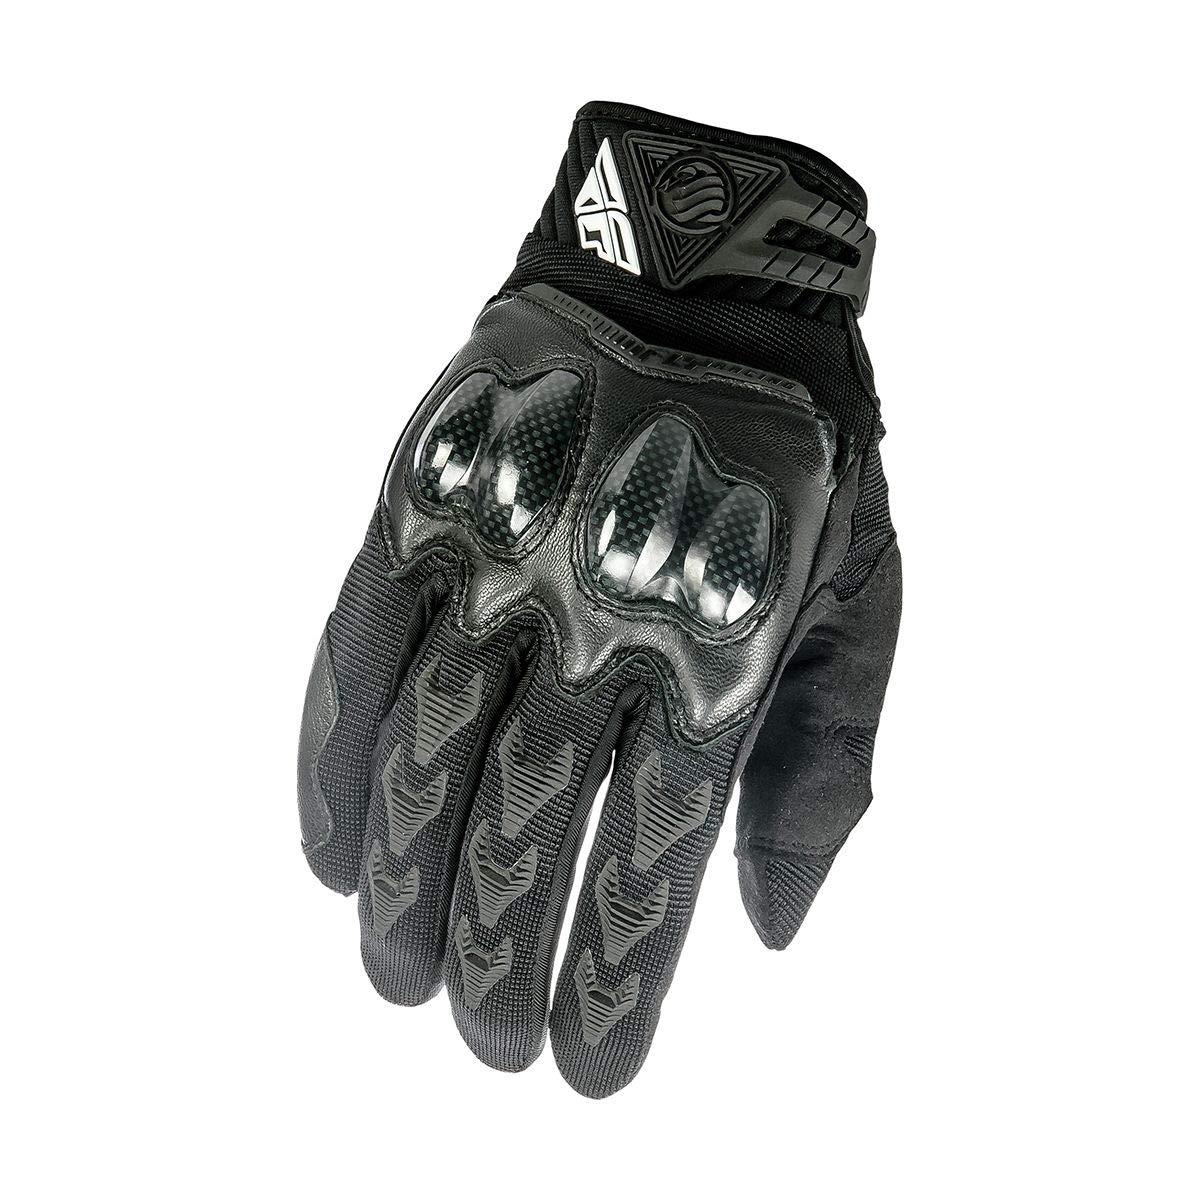 Fly Racing Unisex-Adult Patrol XC Gloves Black Size 11 369-06011